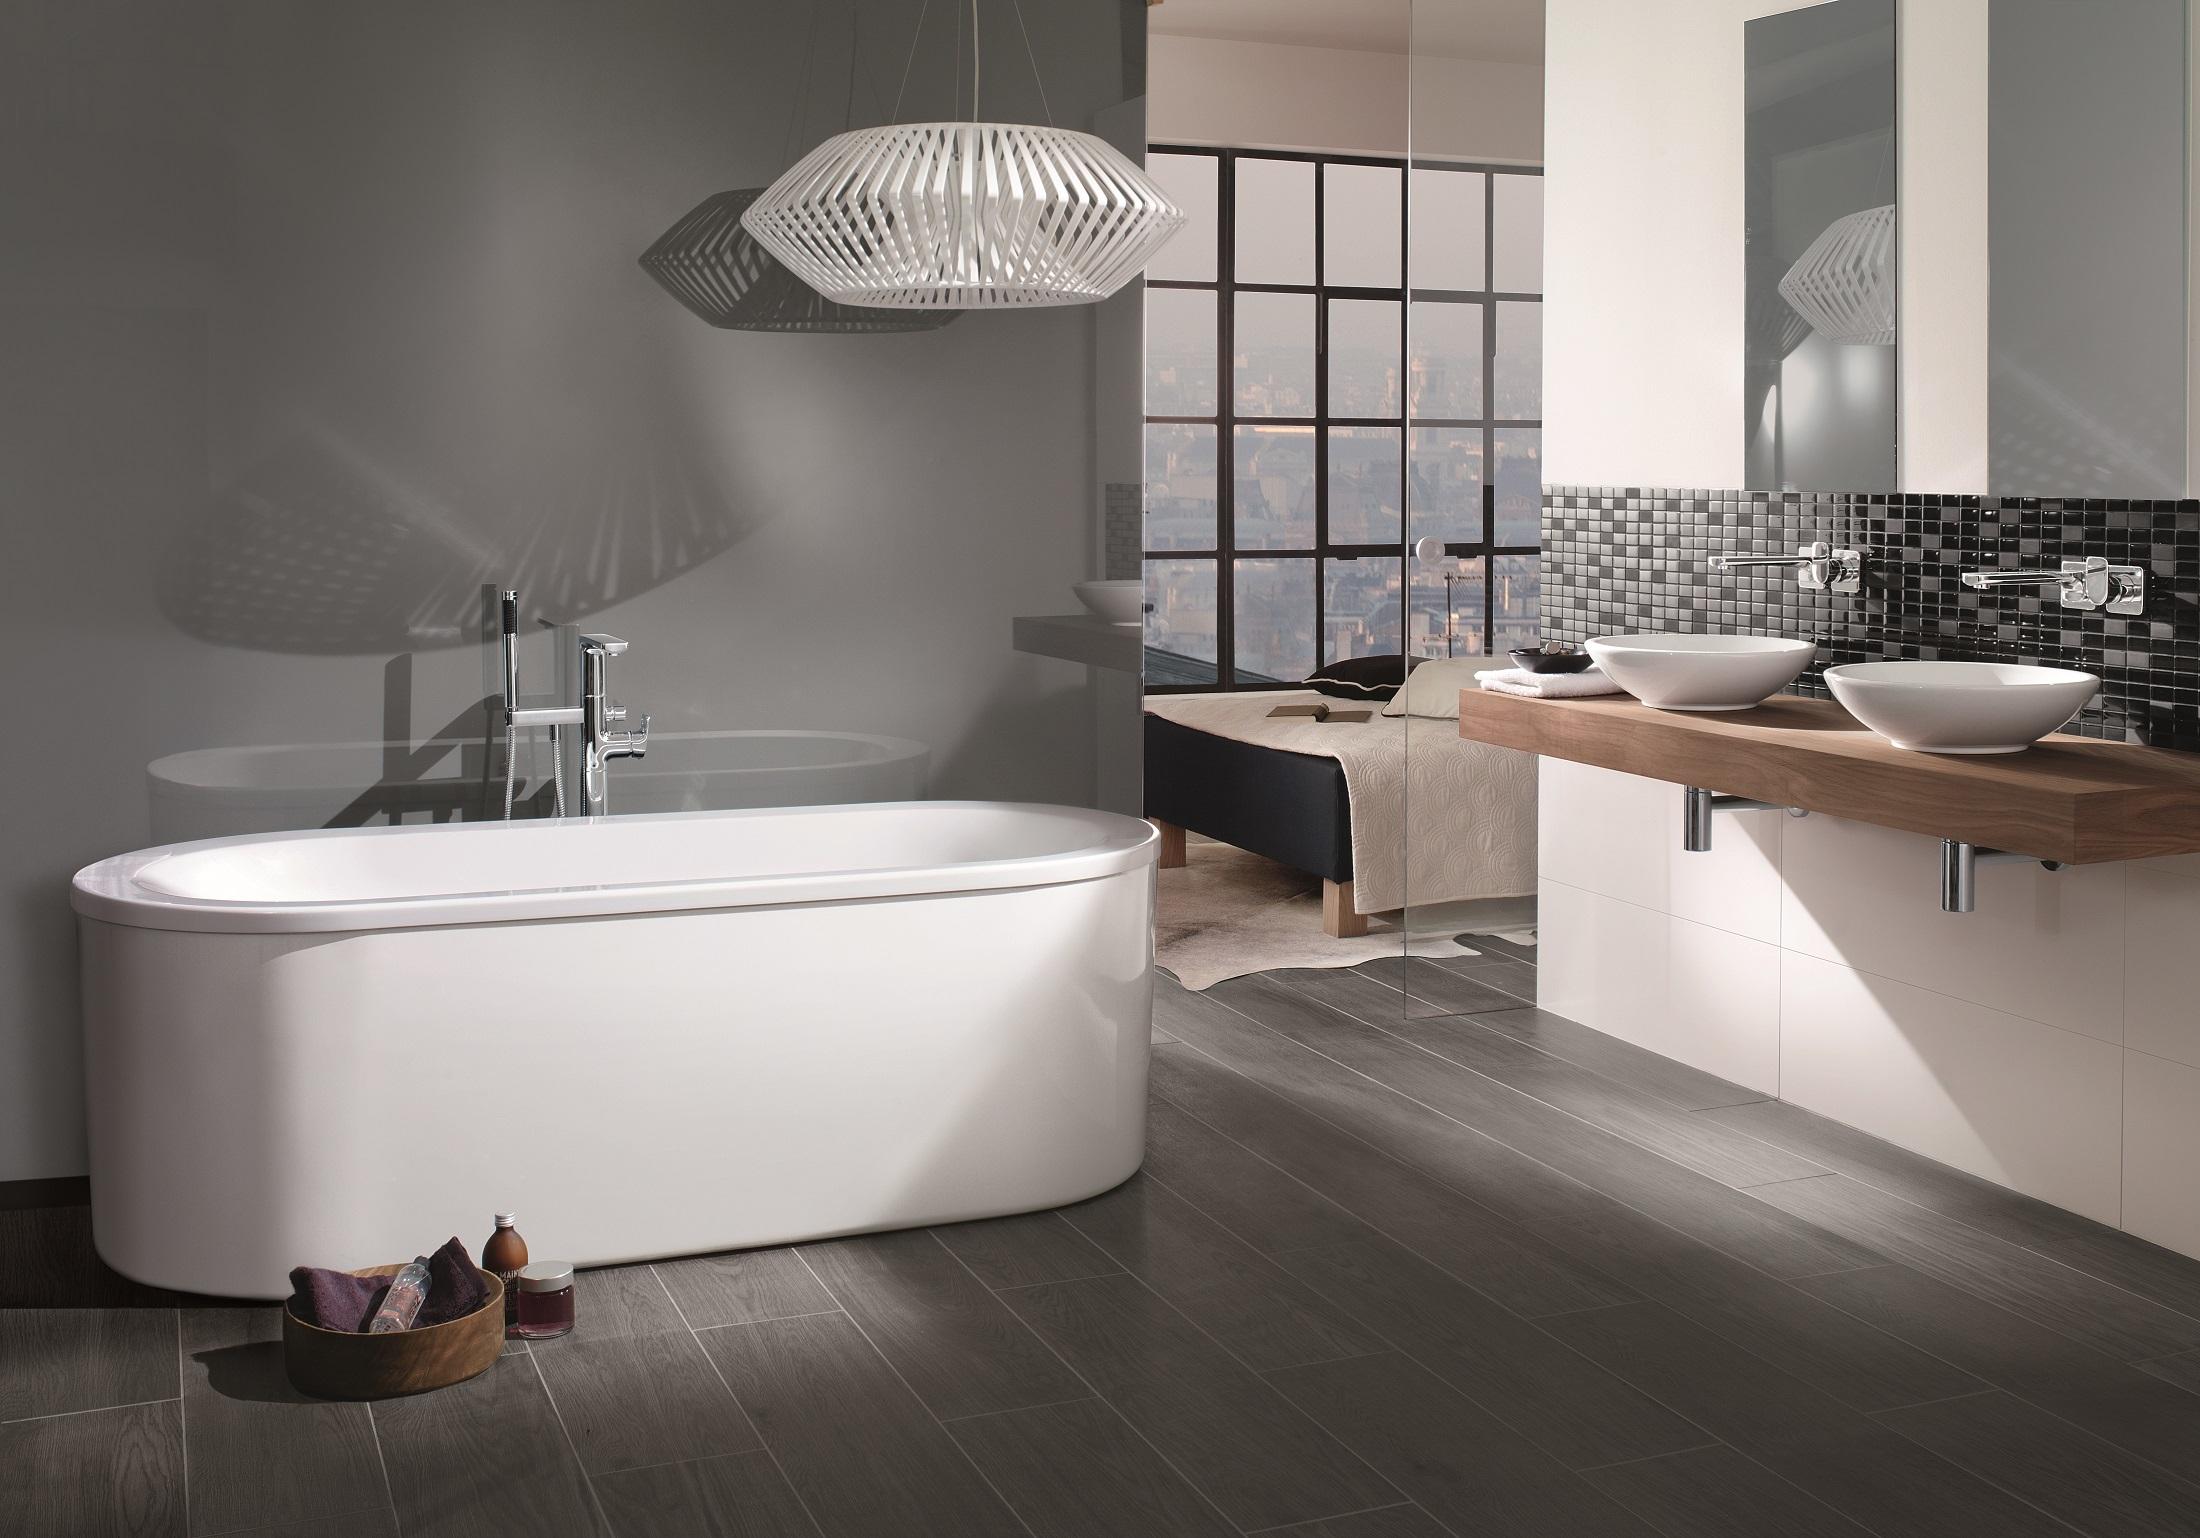 badewanne oval loop friends von villeroy boch bad wellness stylepark. Black Bedroom Furniture Sets. Home Design Ideas